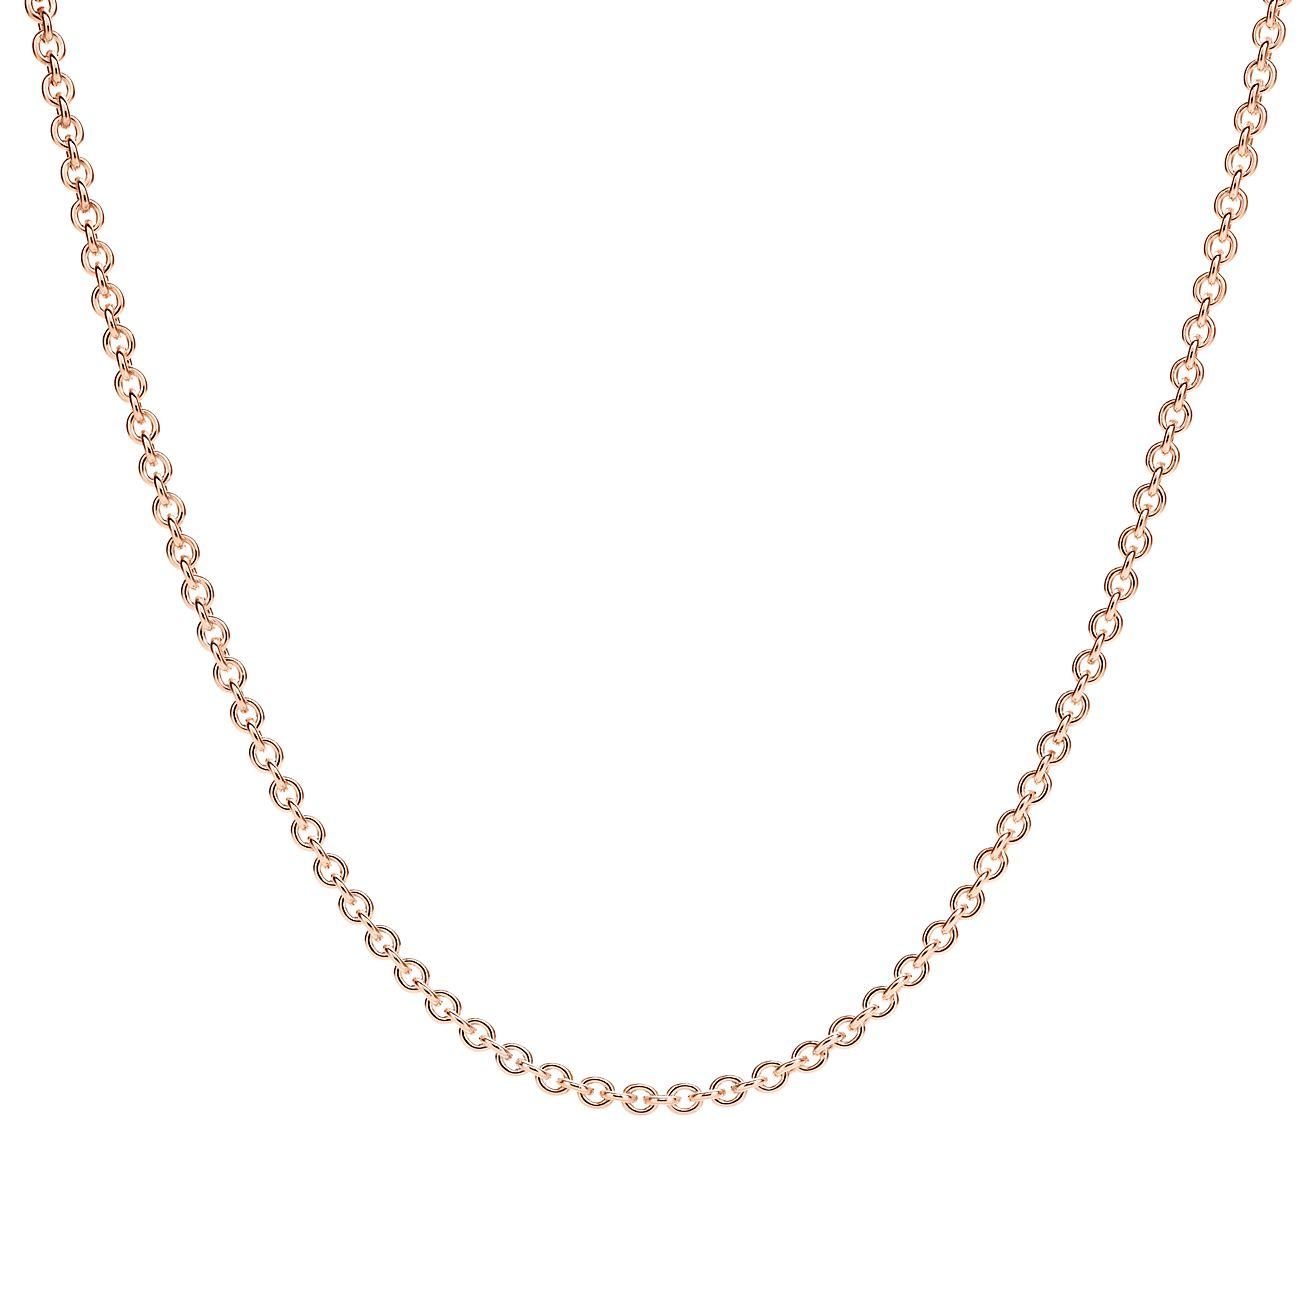 Chaîne en or rose 18 carats. Longueur   45,7 cm.   Tiffany   Co. 8834cd07bf94